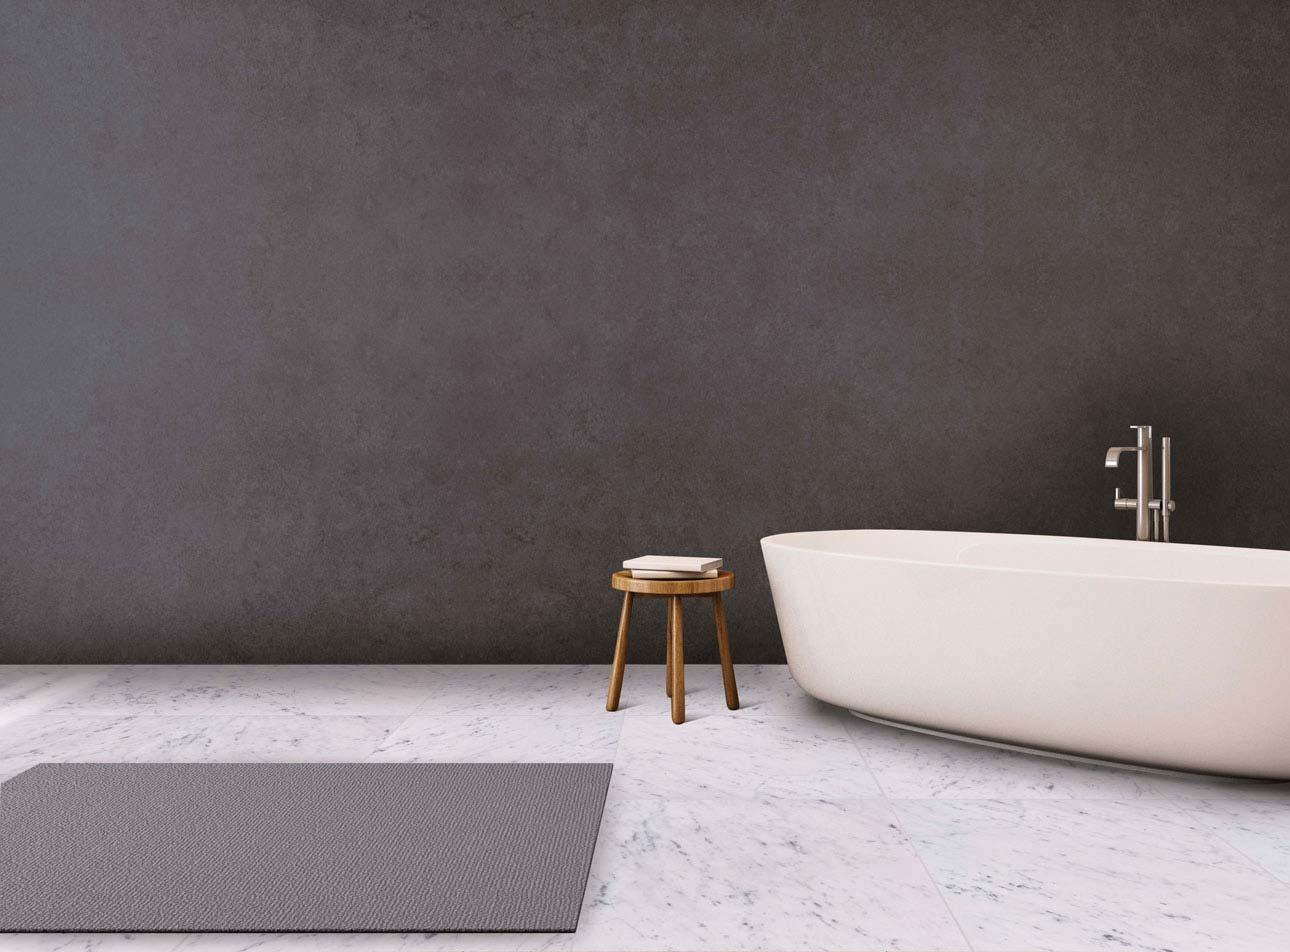 Bagni in marmo bianco fabulous bagno in marmo e pietra - Bagno marmo bianco ...